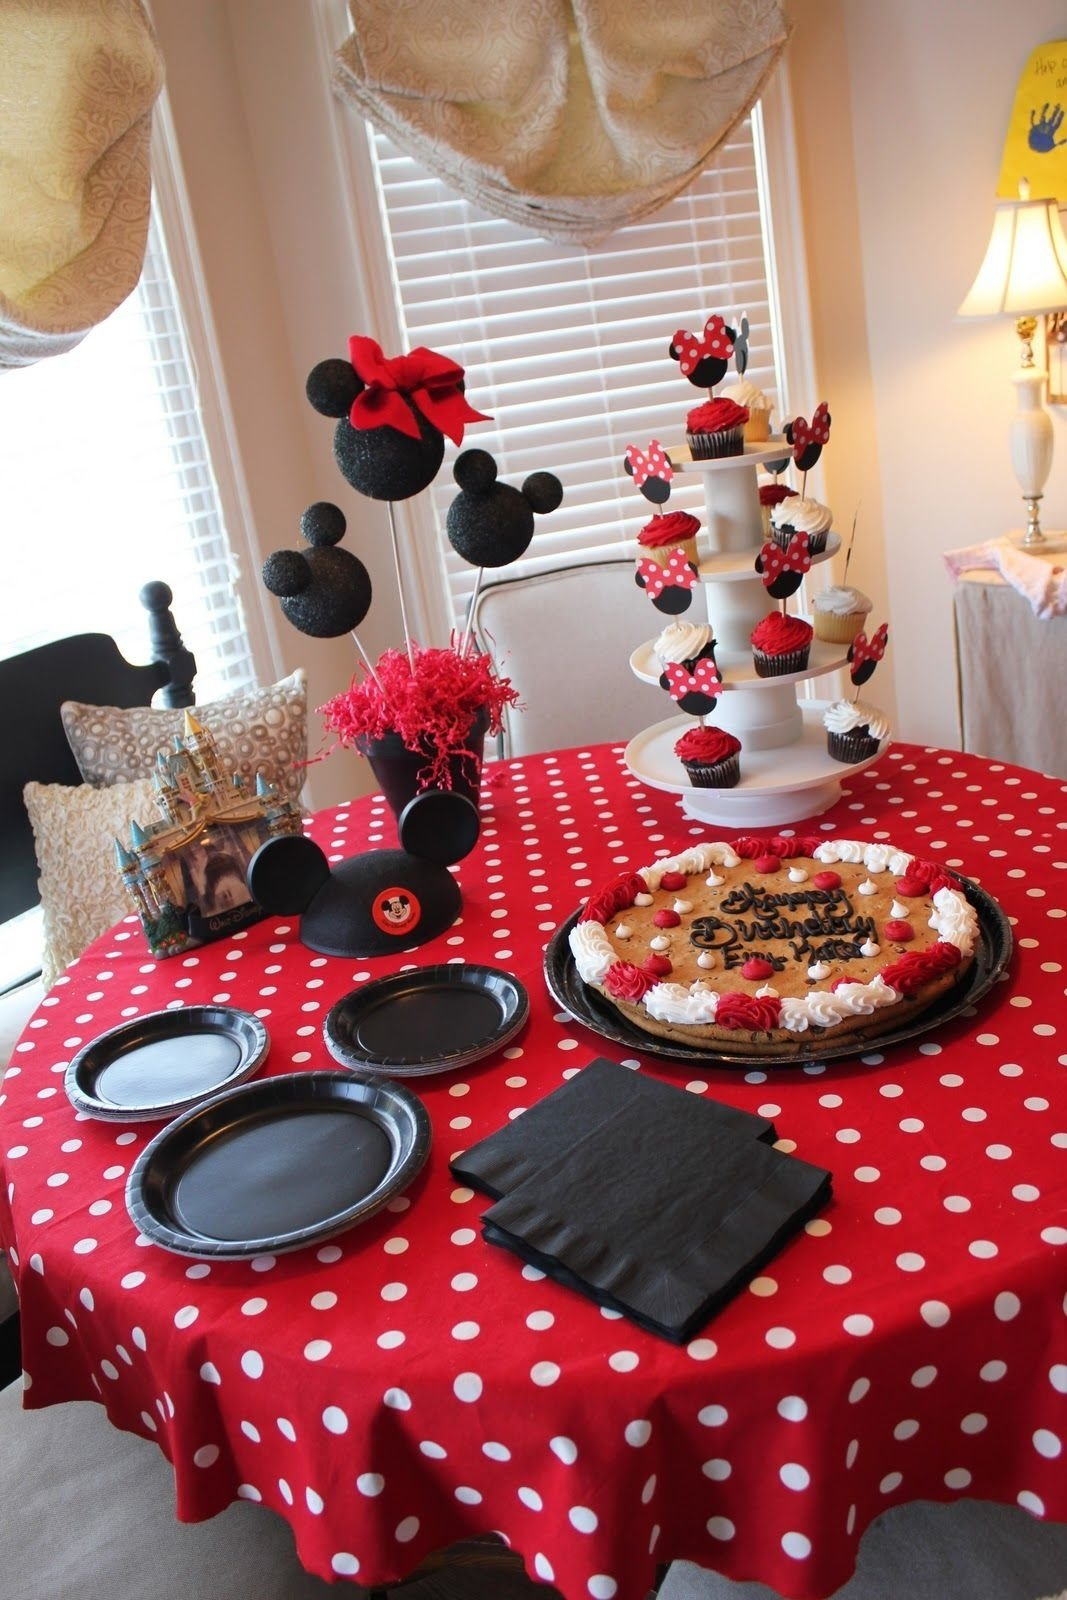 10 Lovely Mickey Mouse Party Ideas Pinterest mickey mouse party cupcakes and decor i love it party ideas